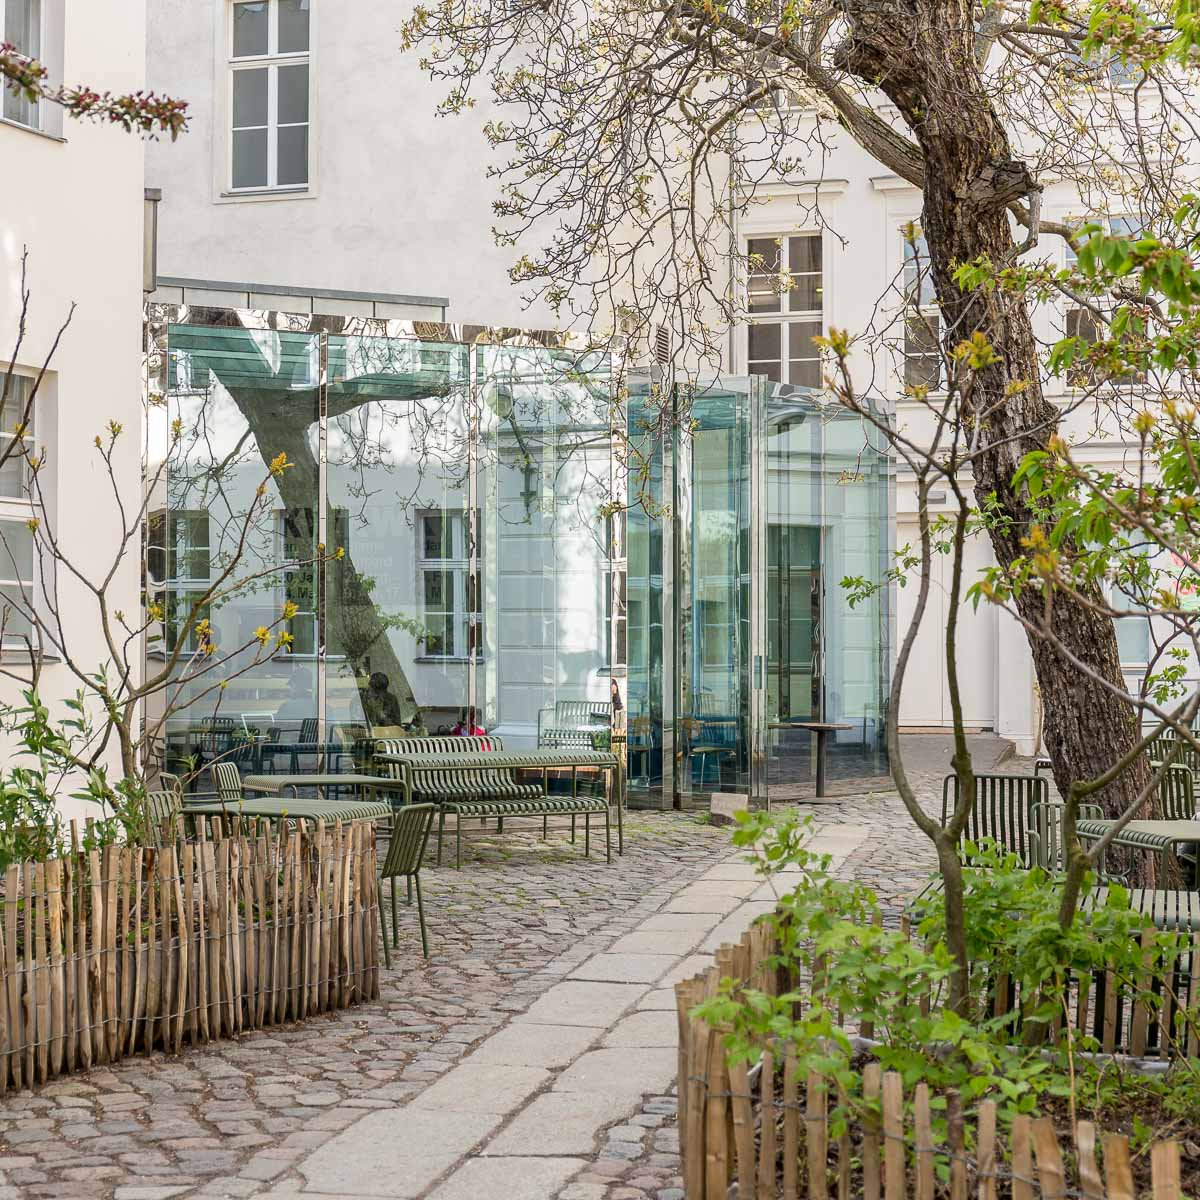 Café Bravo in der KW in Berlin-Mitte © Fran Sperling